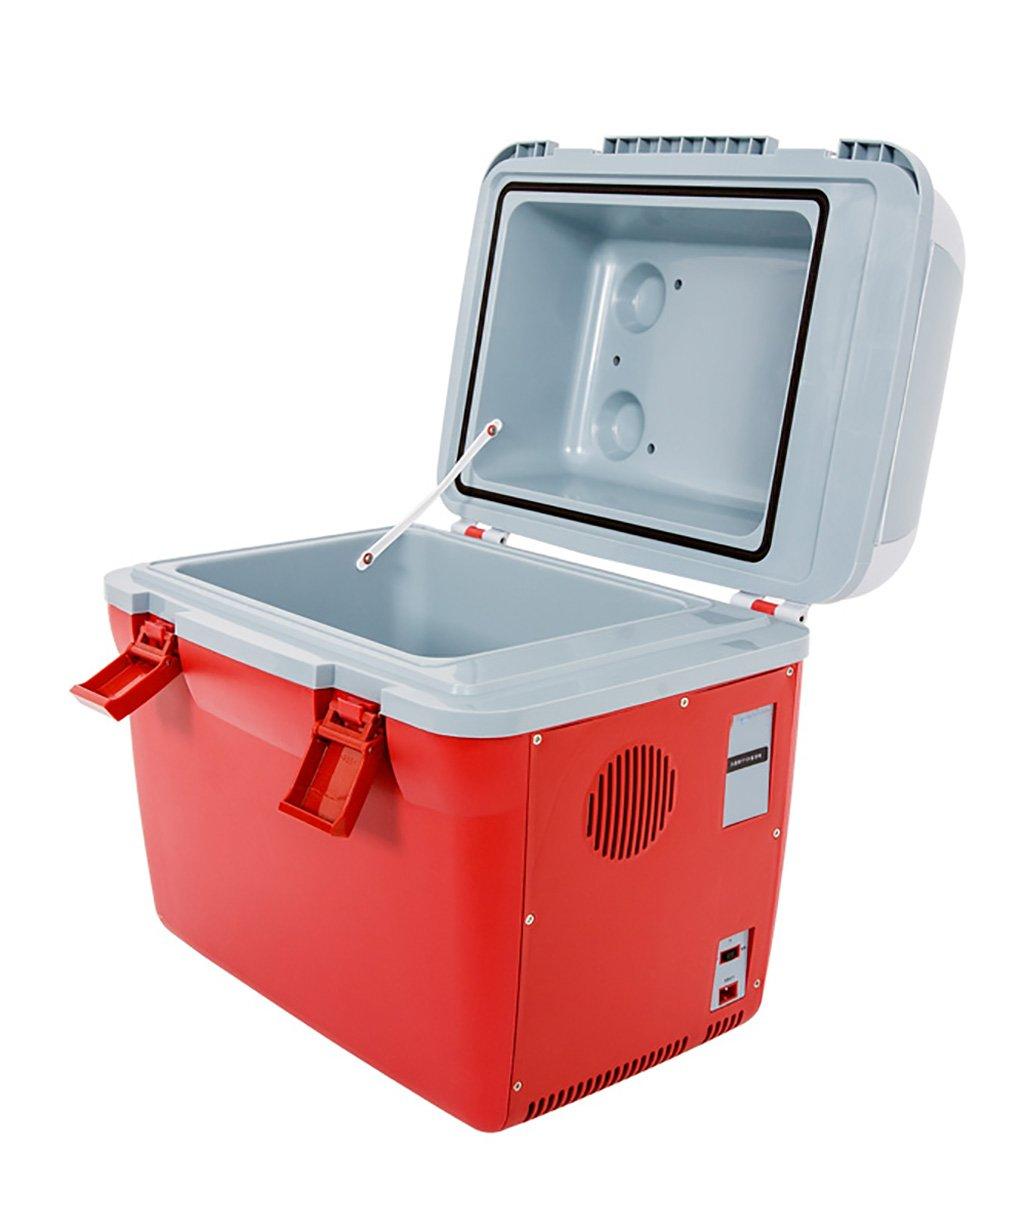 LIQICAI 18L Kapazität Elektrische Kühlbox 12V DC Elektrisch Kühlbox Kühler Extrem Kühlbox Isotherm